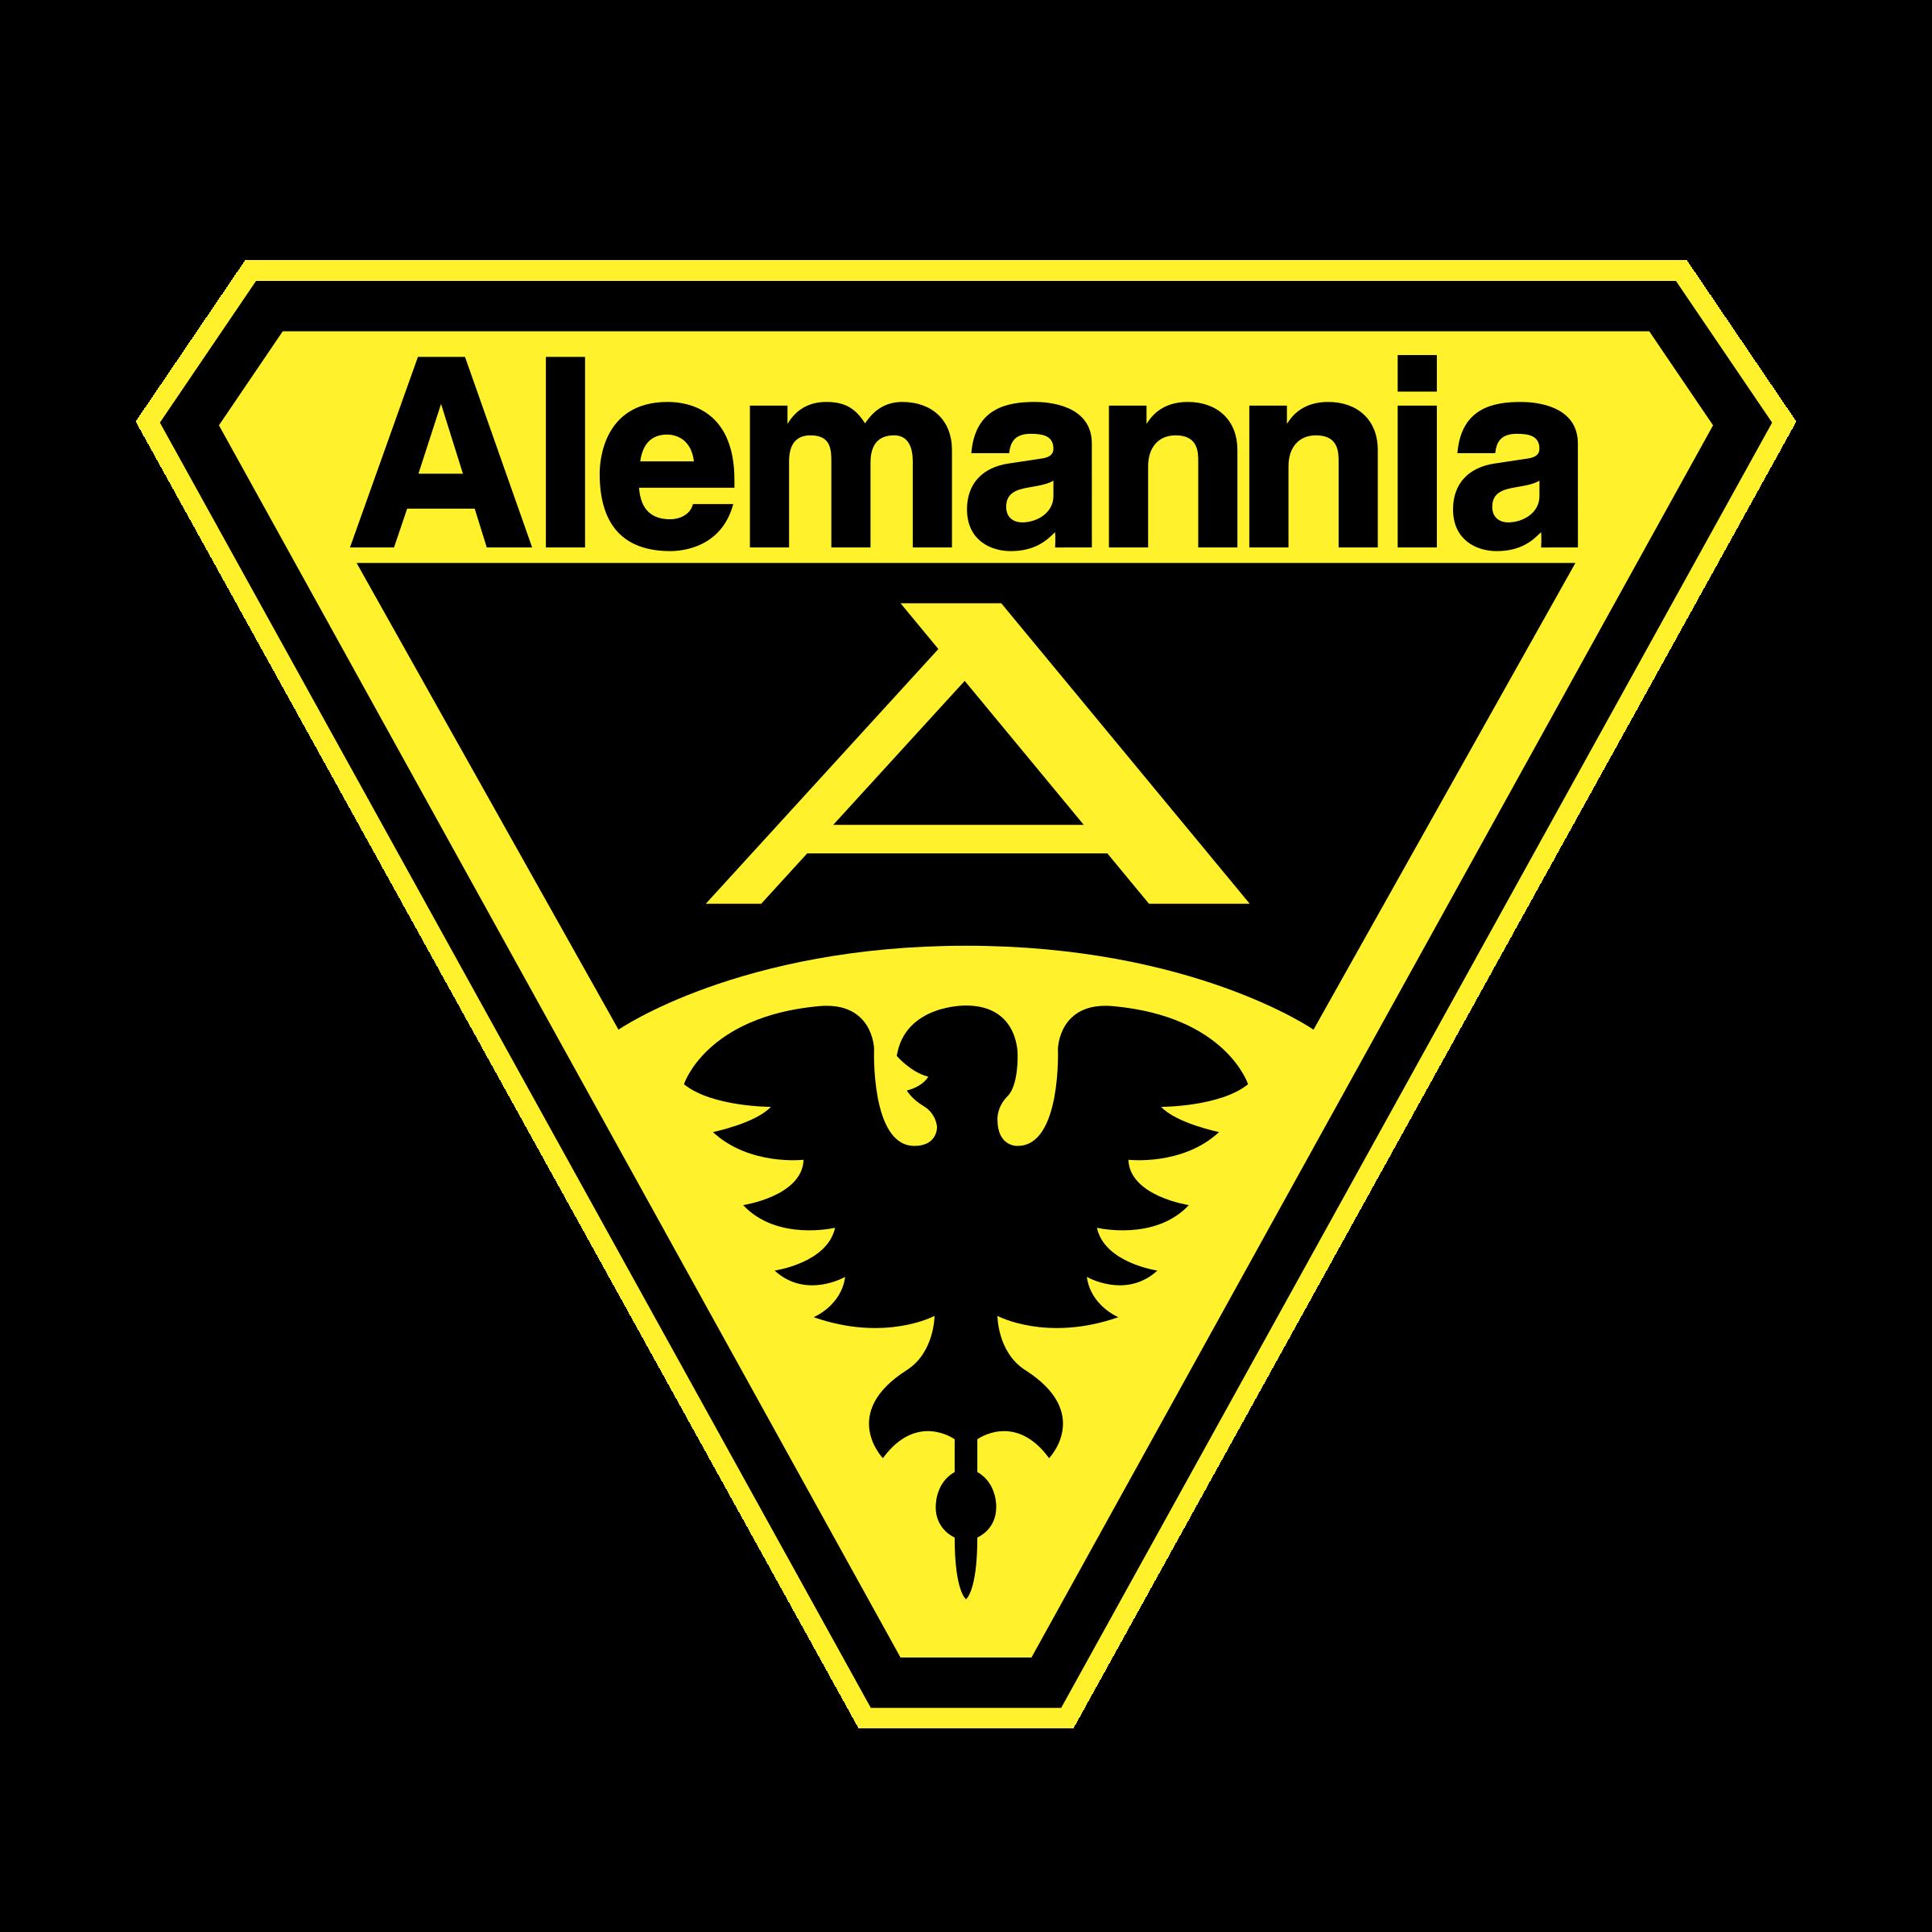 Alemannia Aachen Insolvent